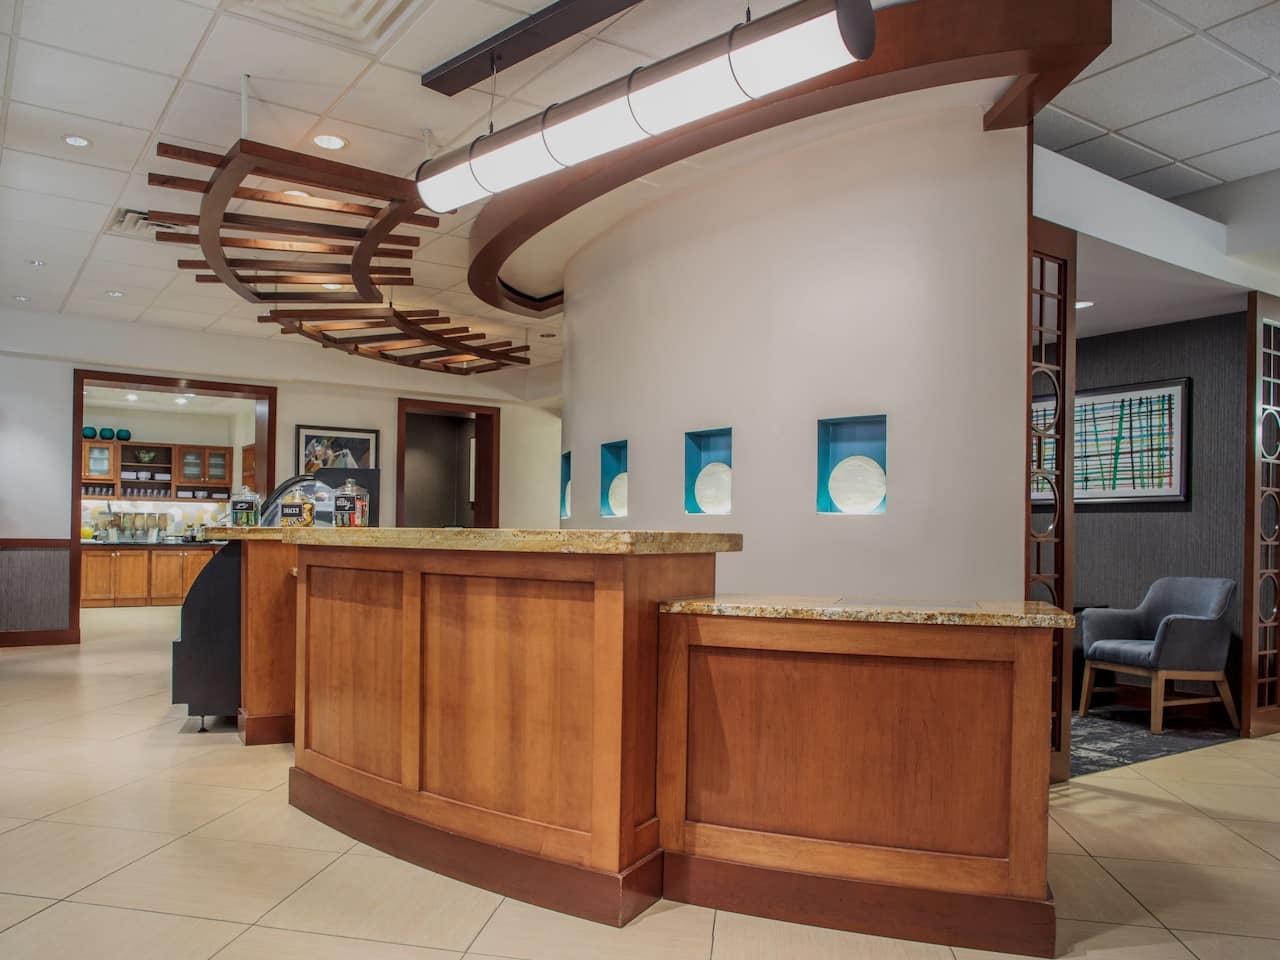 Hyatt Place Cincinnati / Blue Ash Front Desk